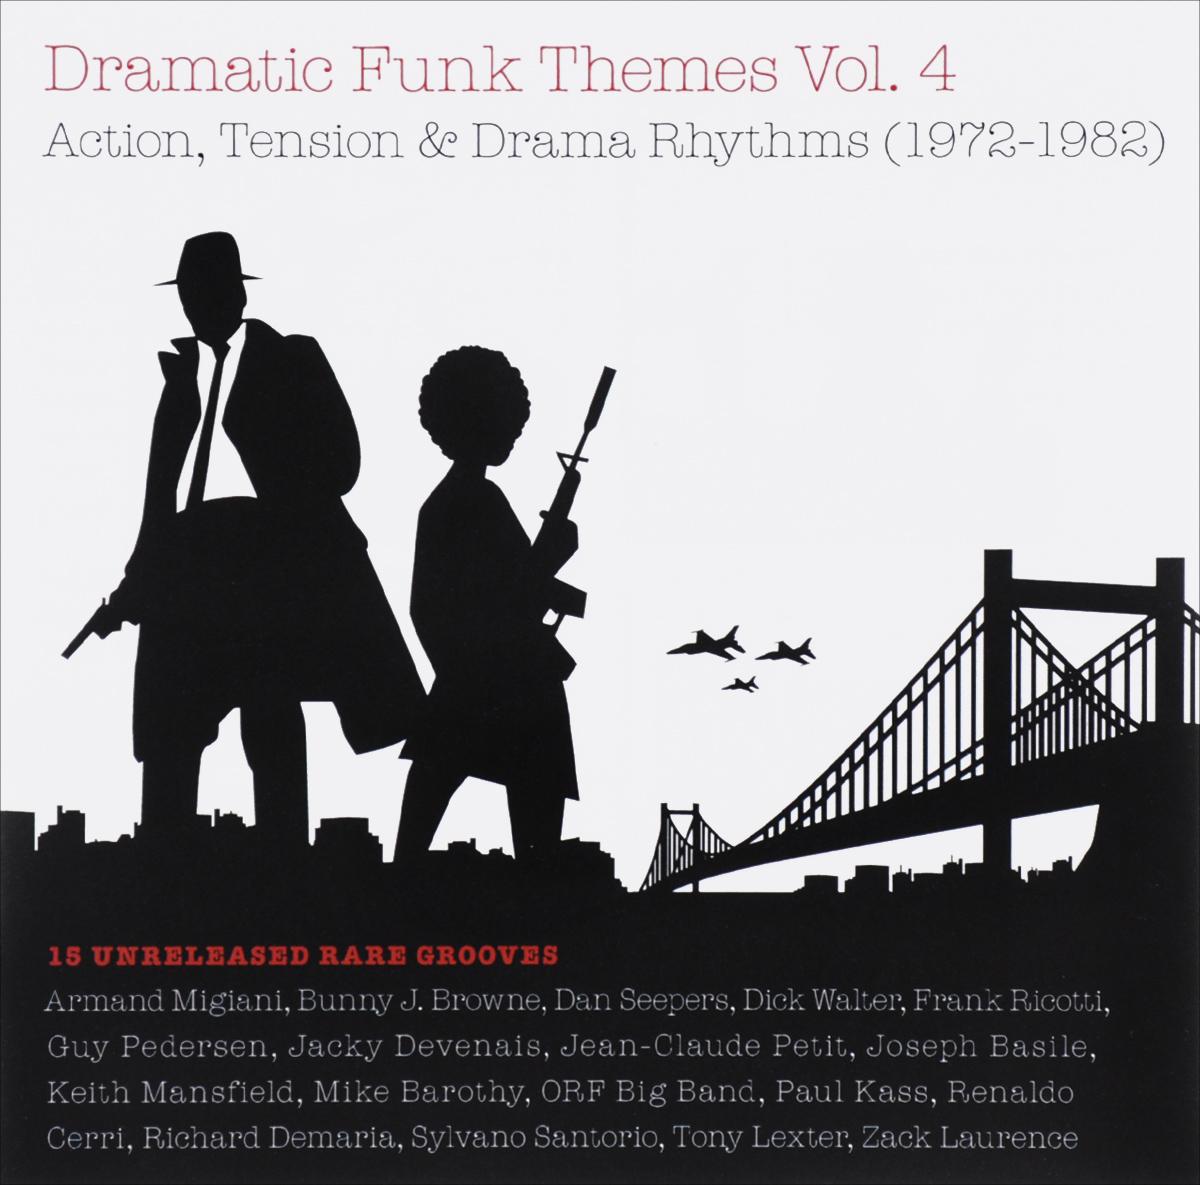 Dramatic Funk Themes Volume 4. Action, Tension & Drama Rhythms (1972-1982)